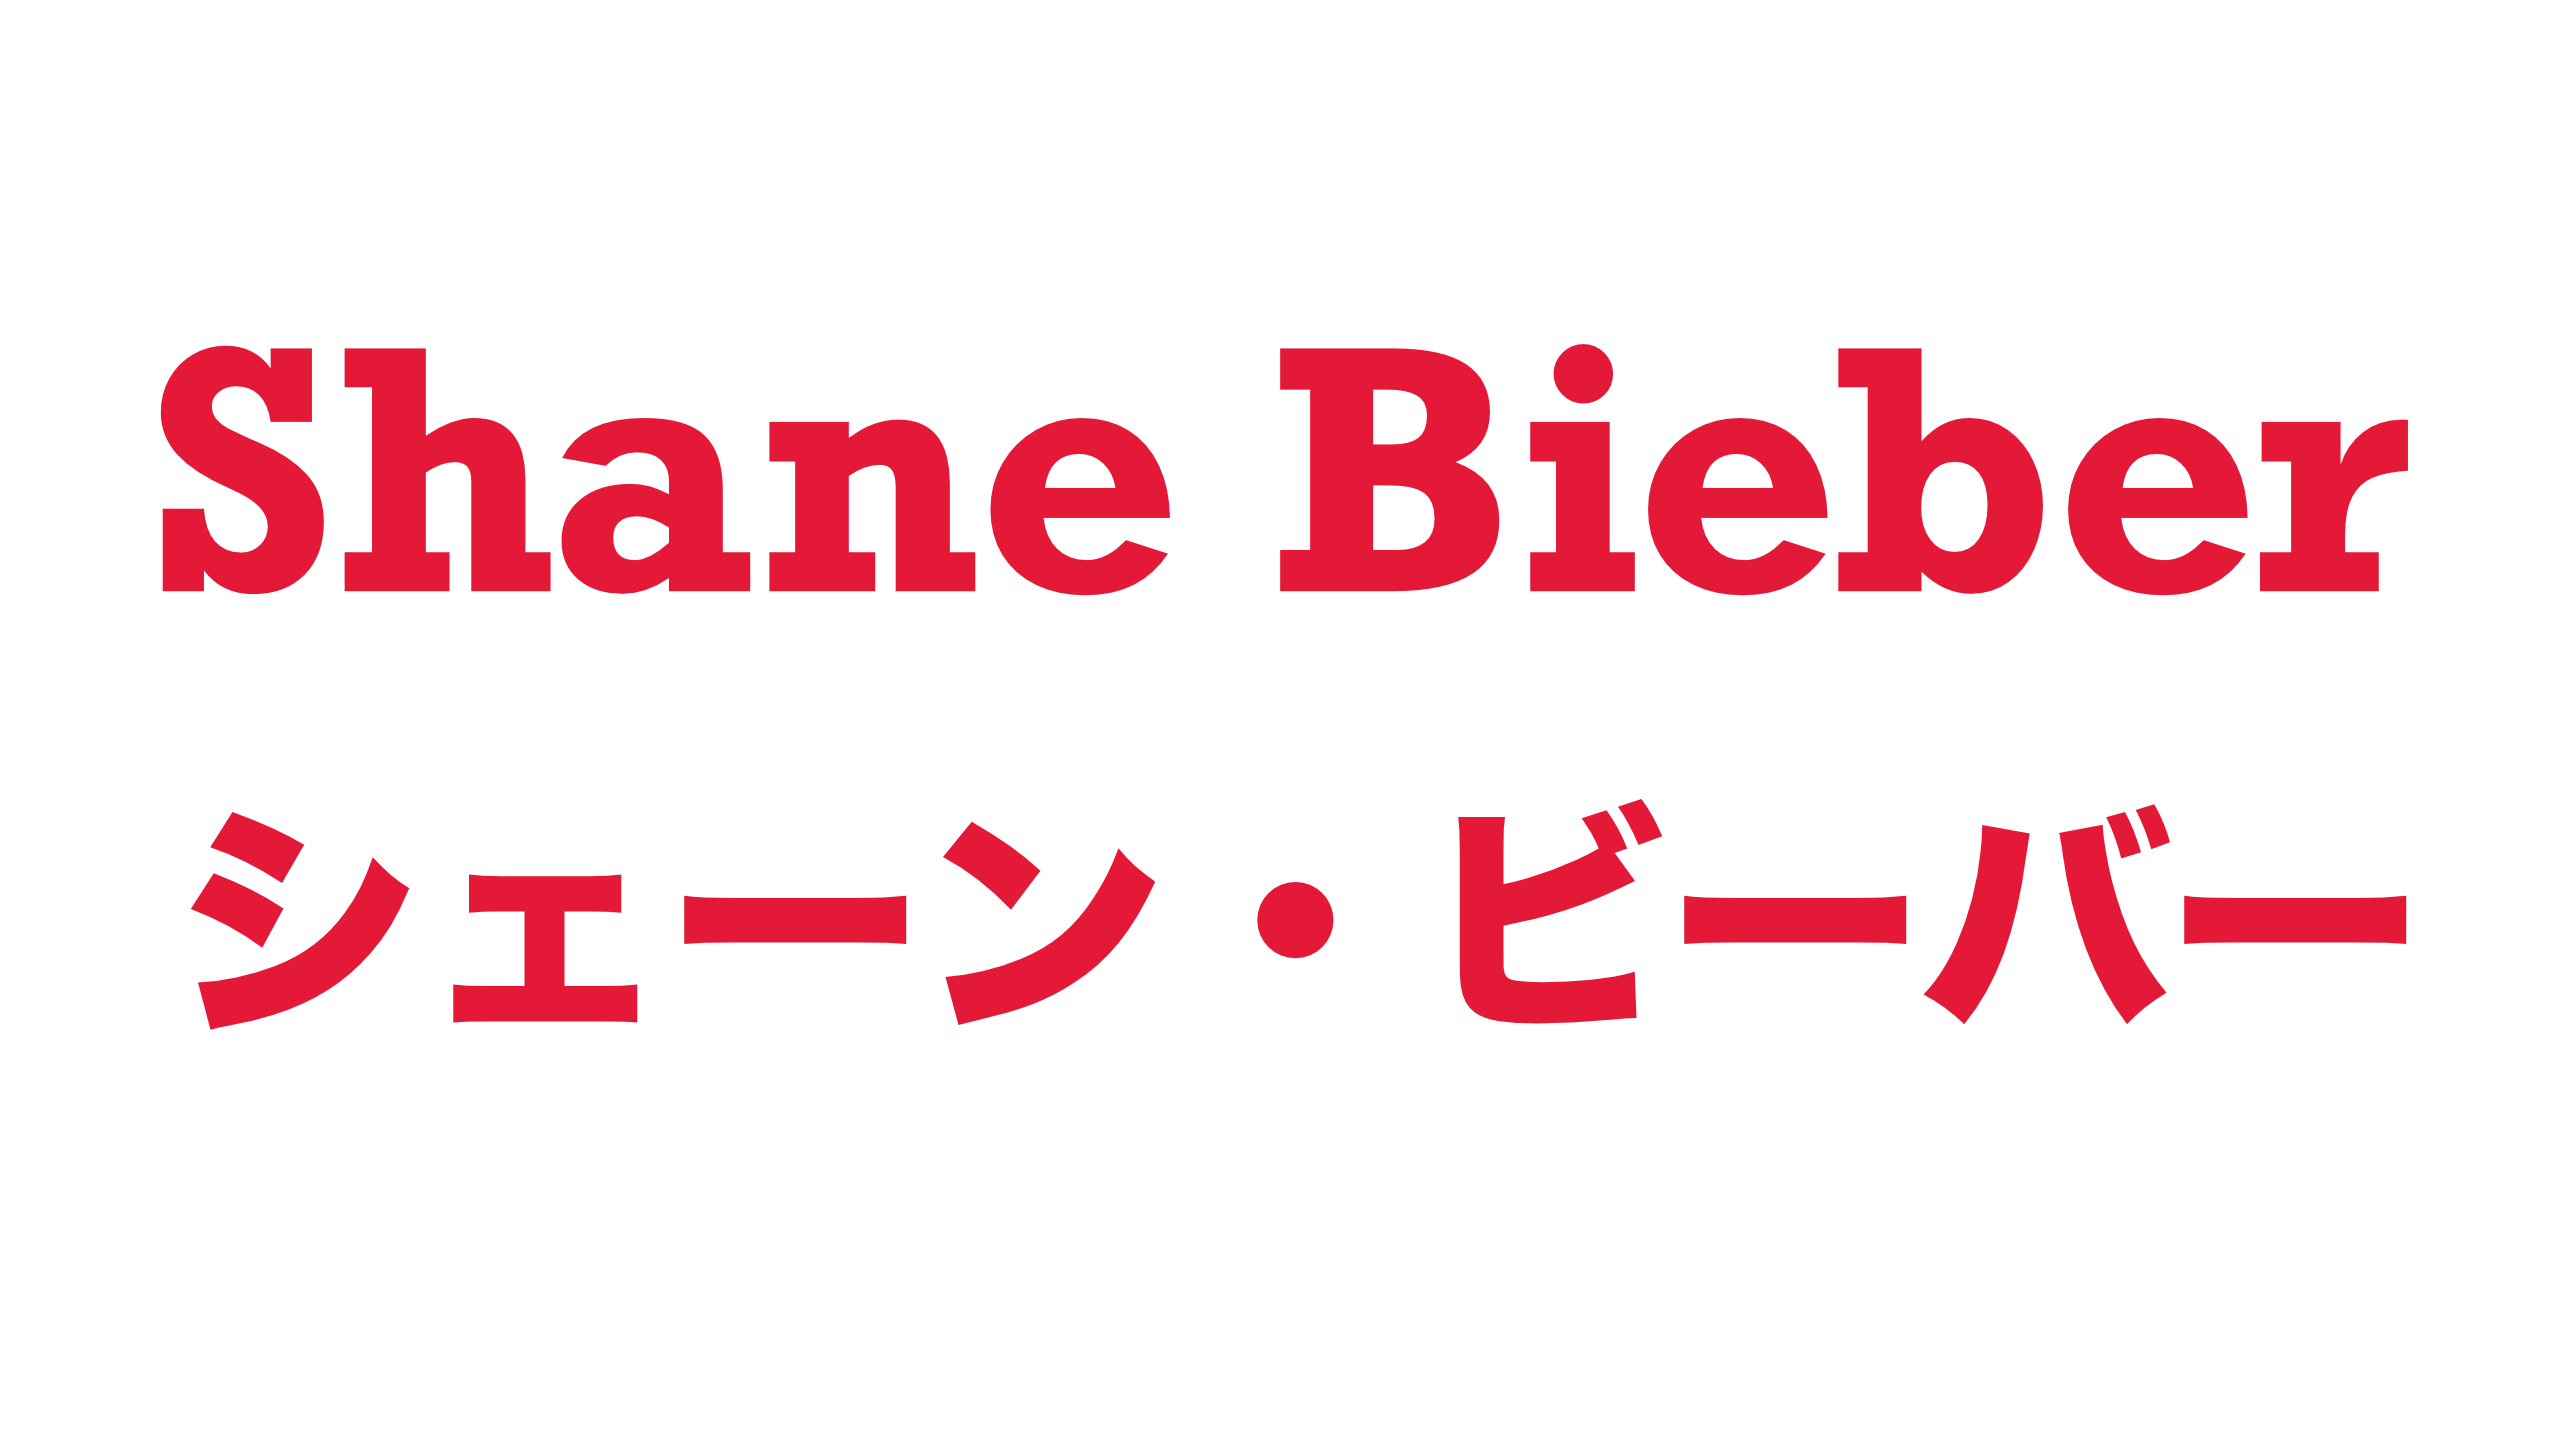 shane-bieber